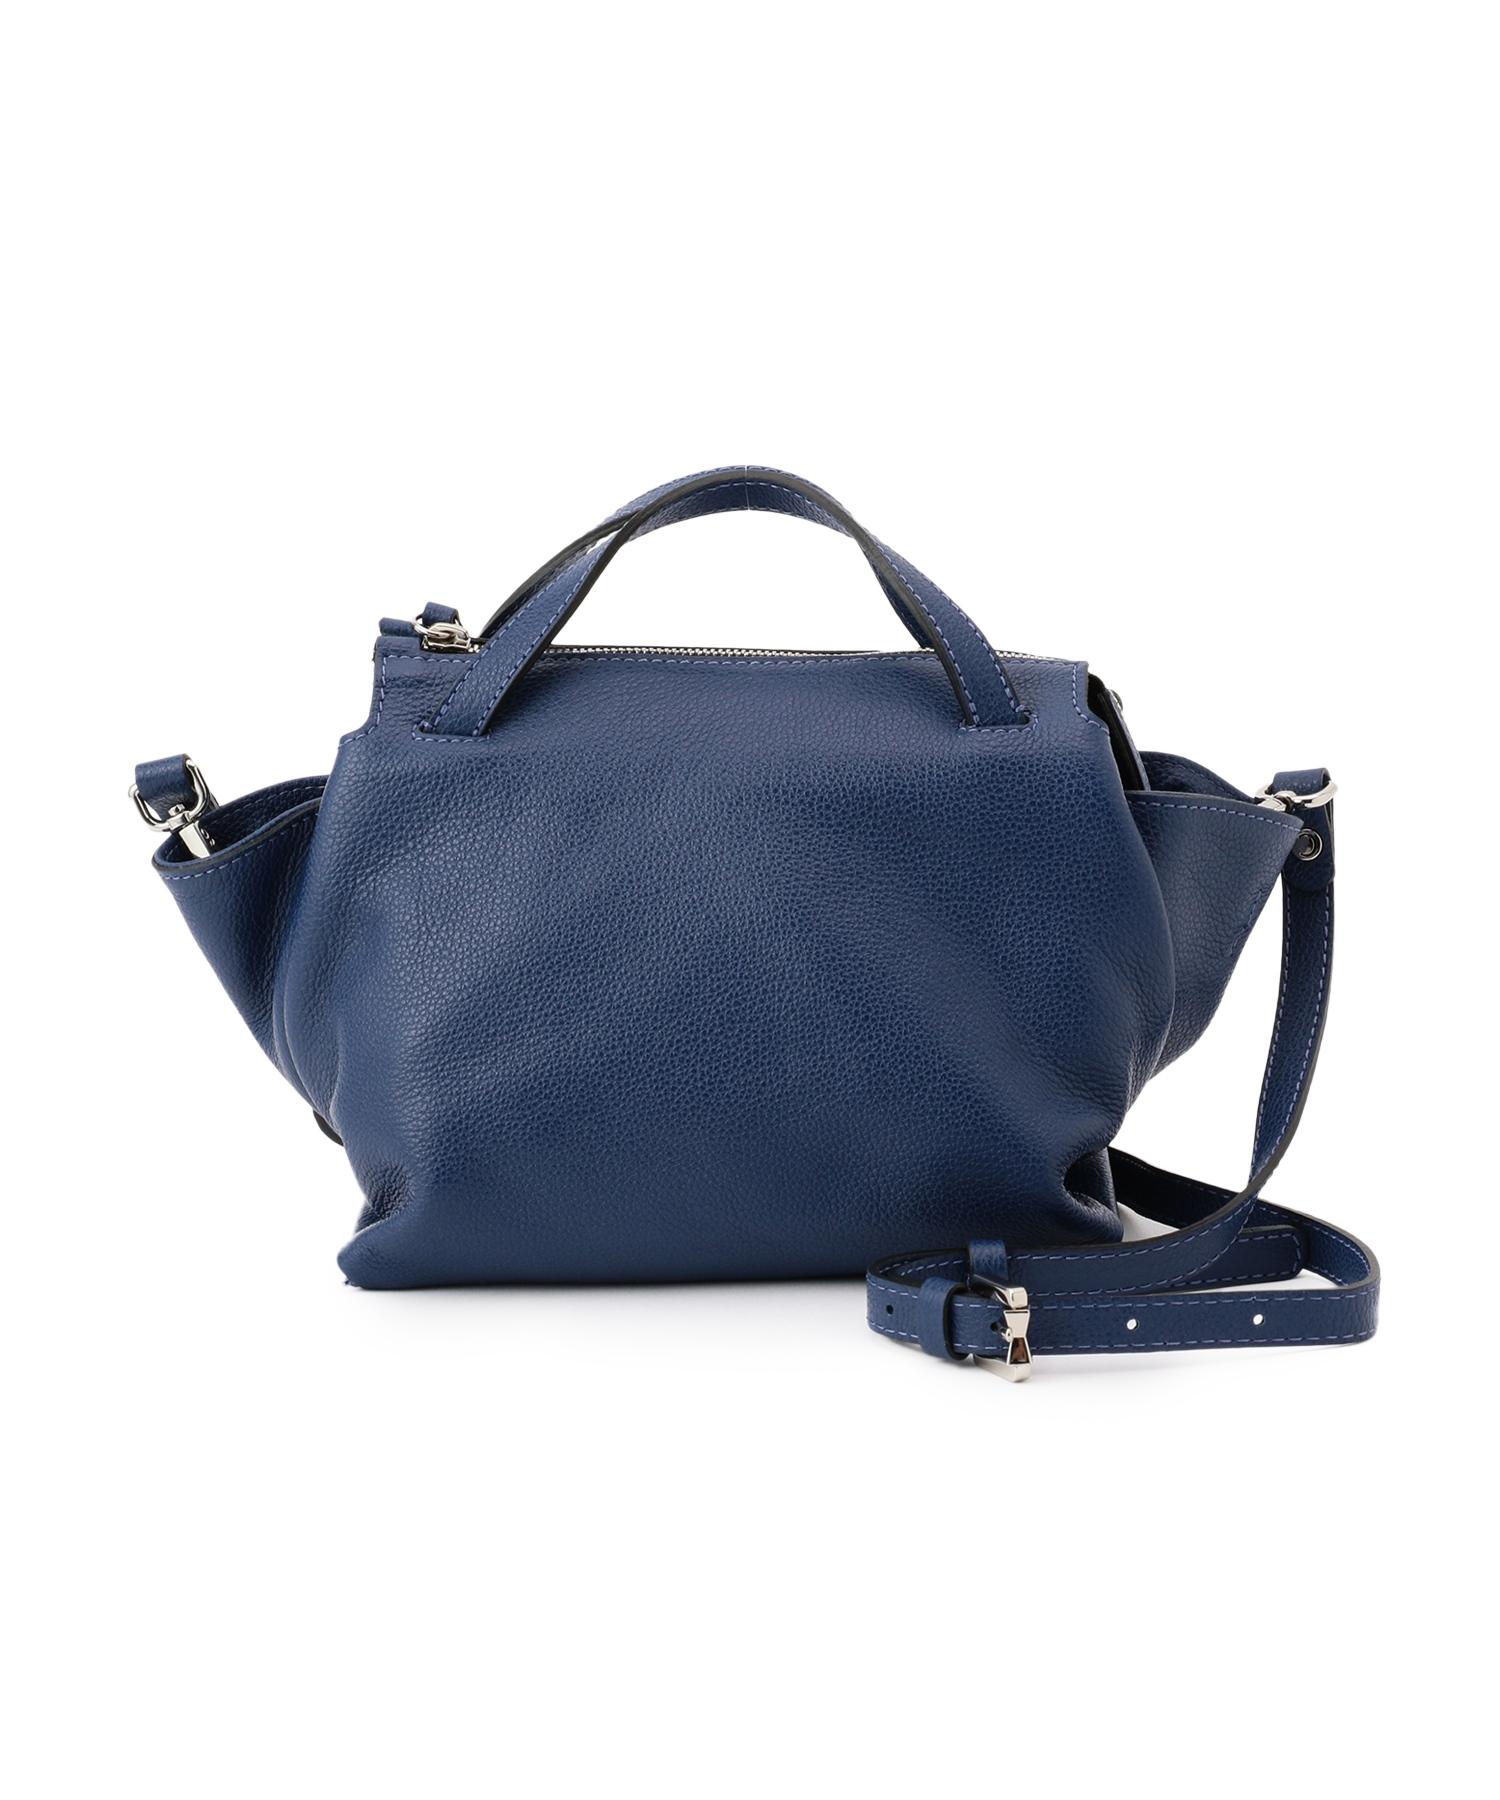 GIANNI CHIARINI / ショルダー付きバッグ